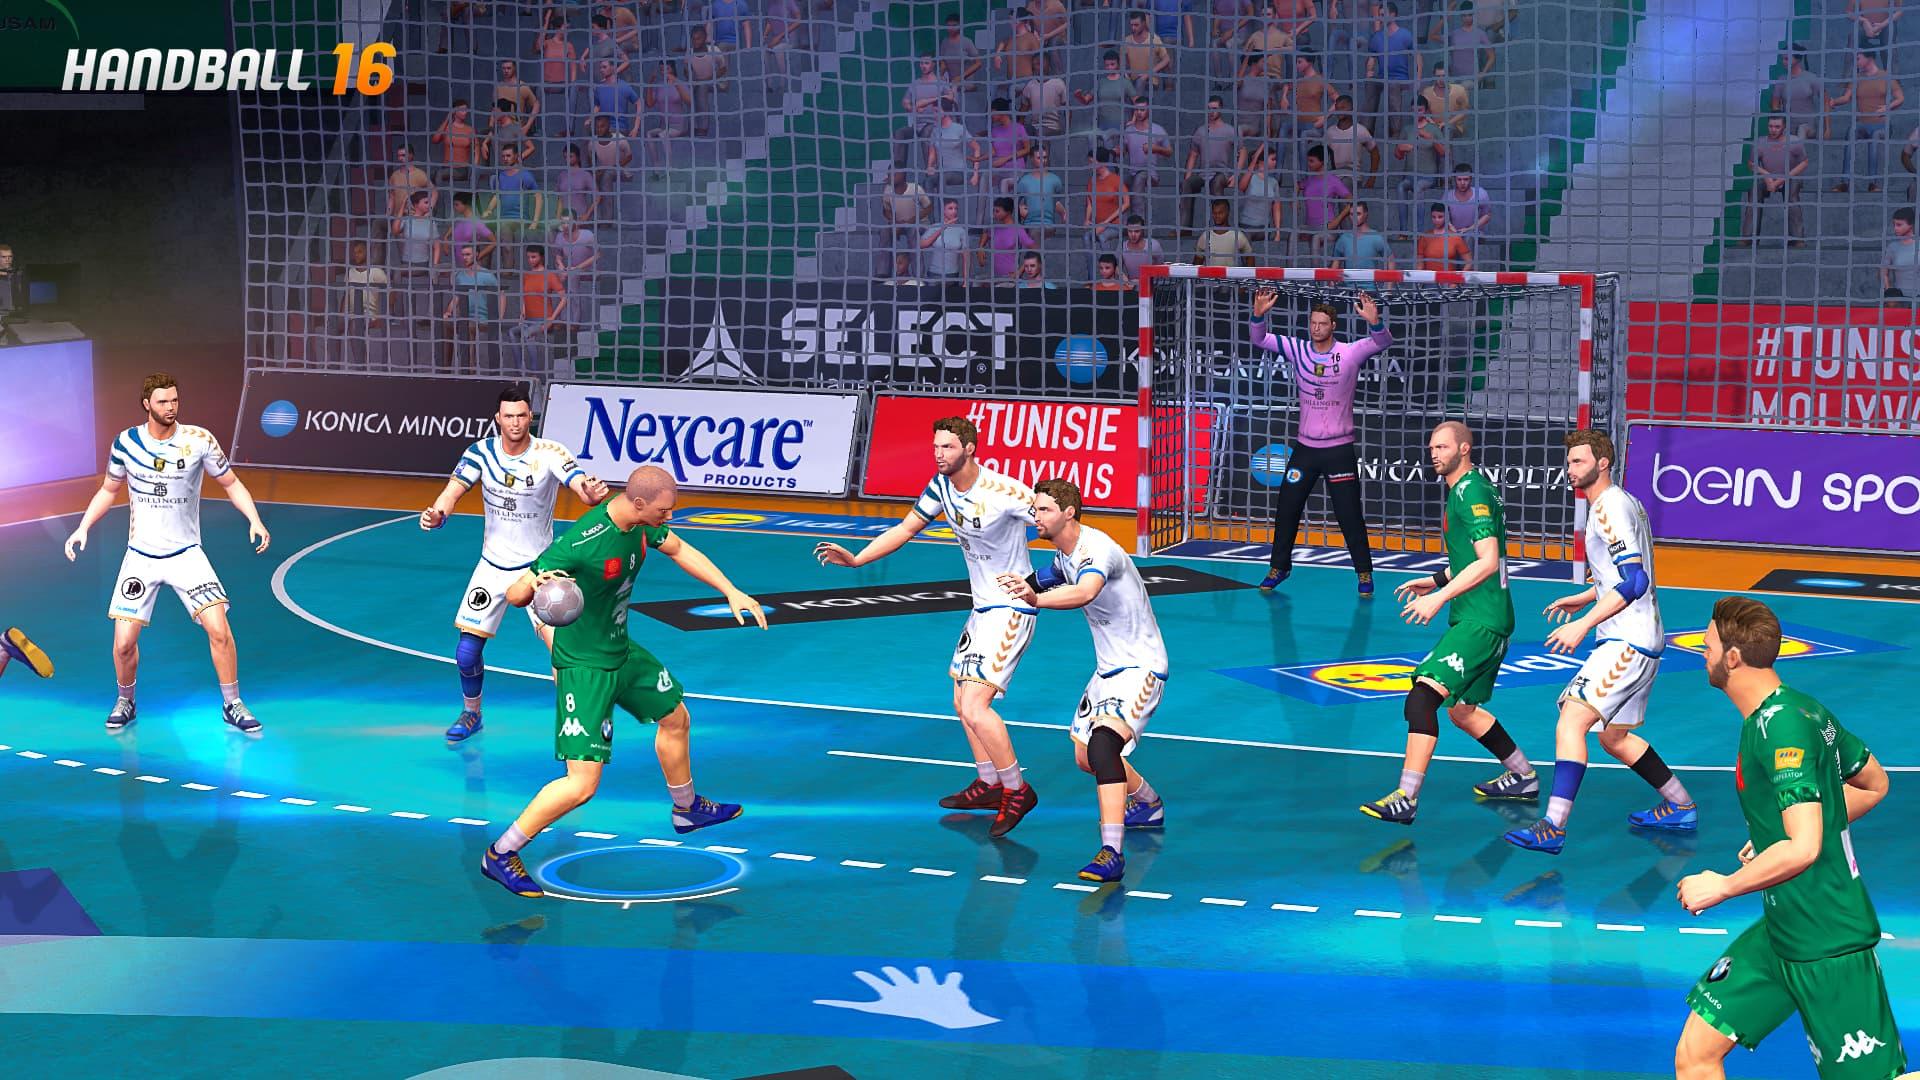 Handball 16 - Image n°6